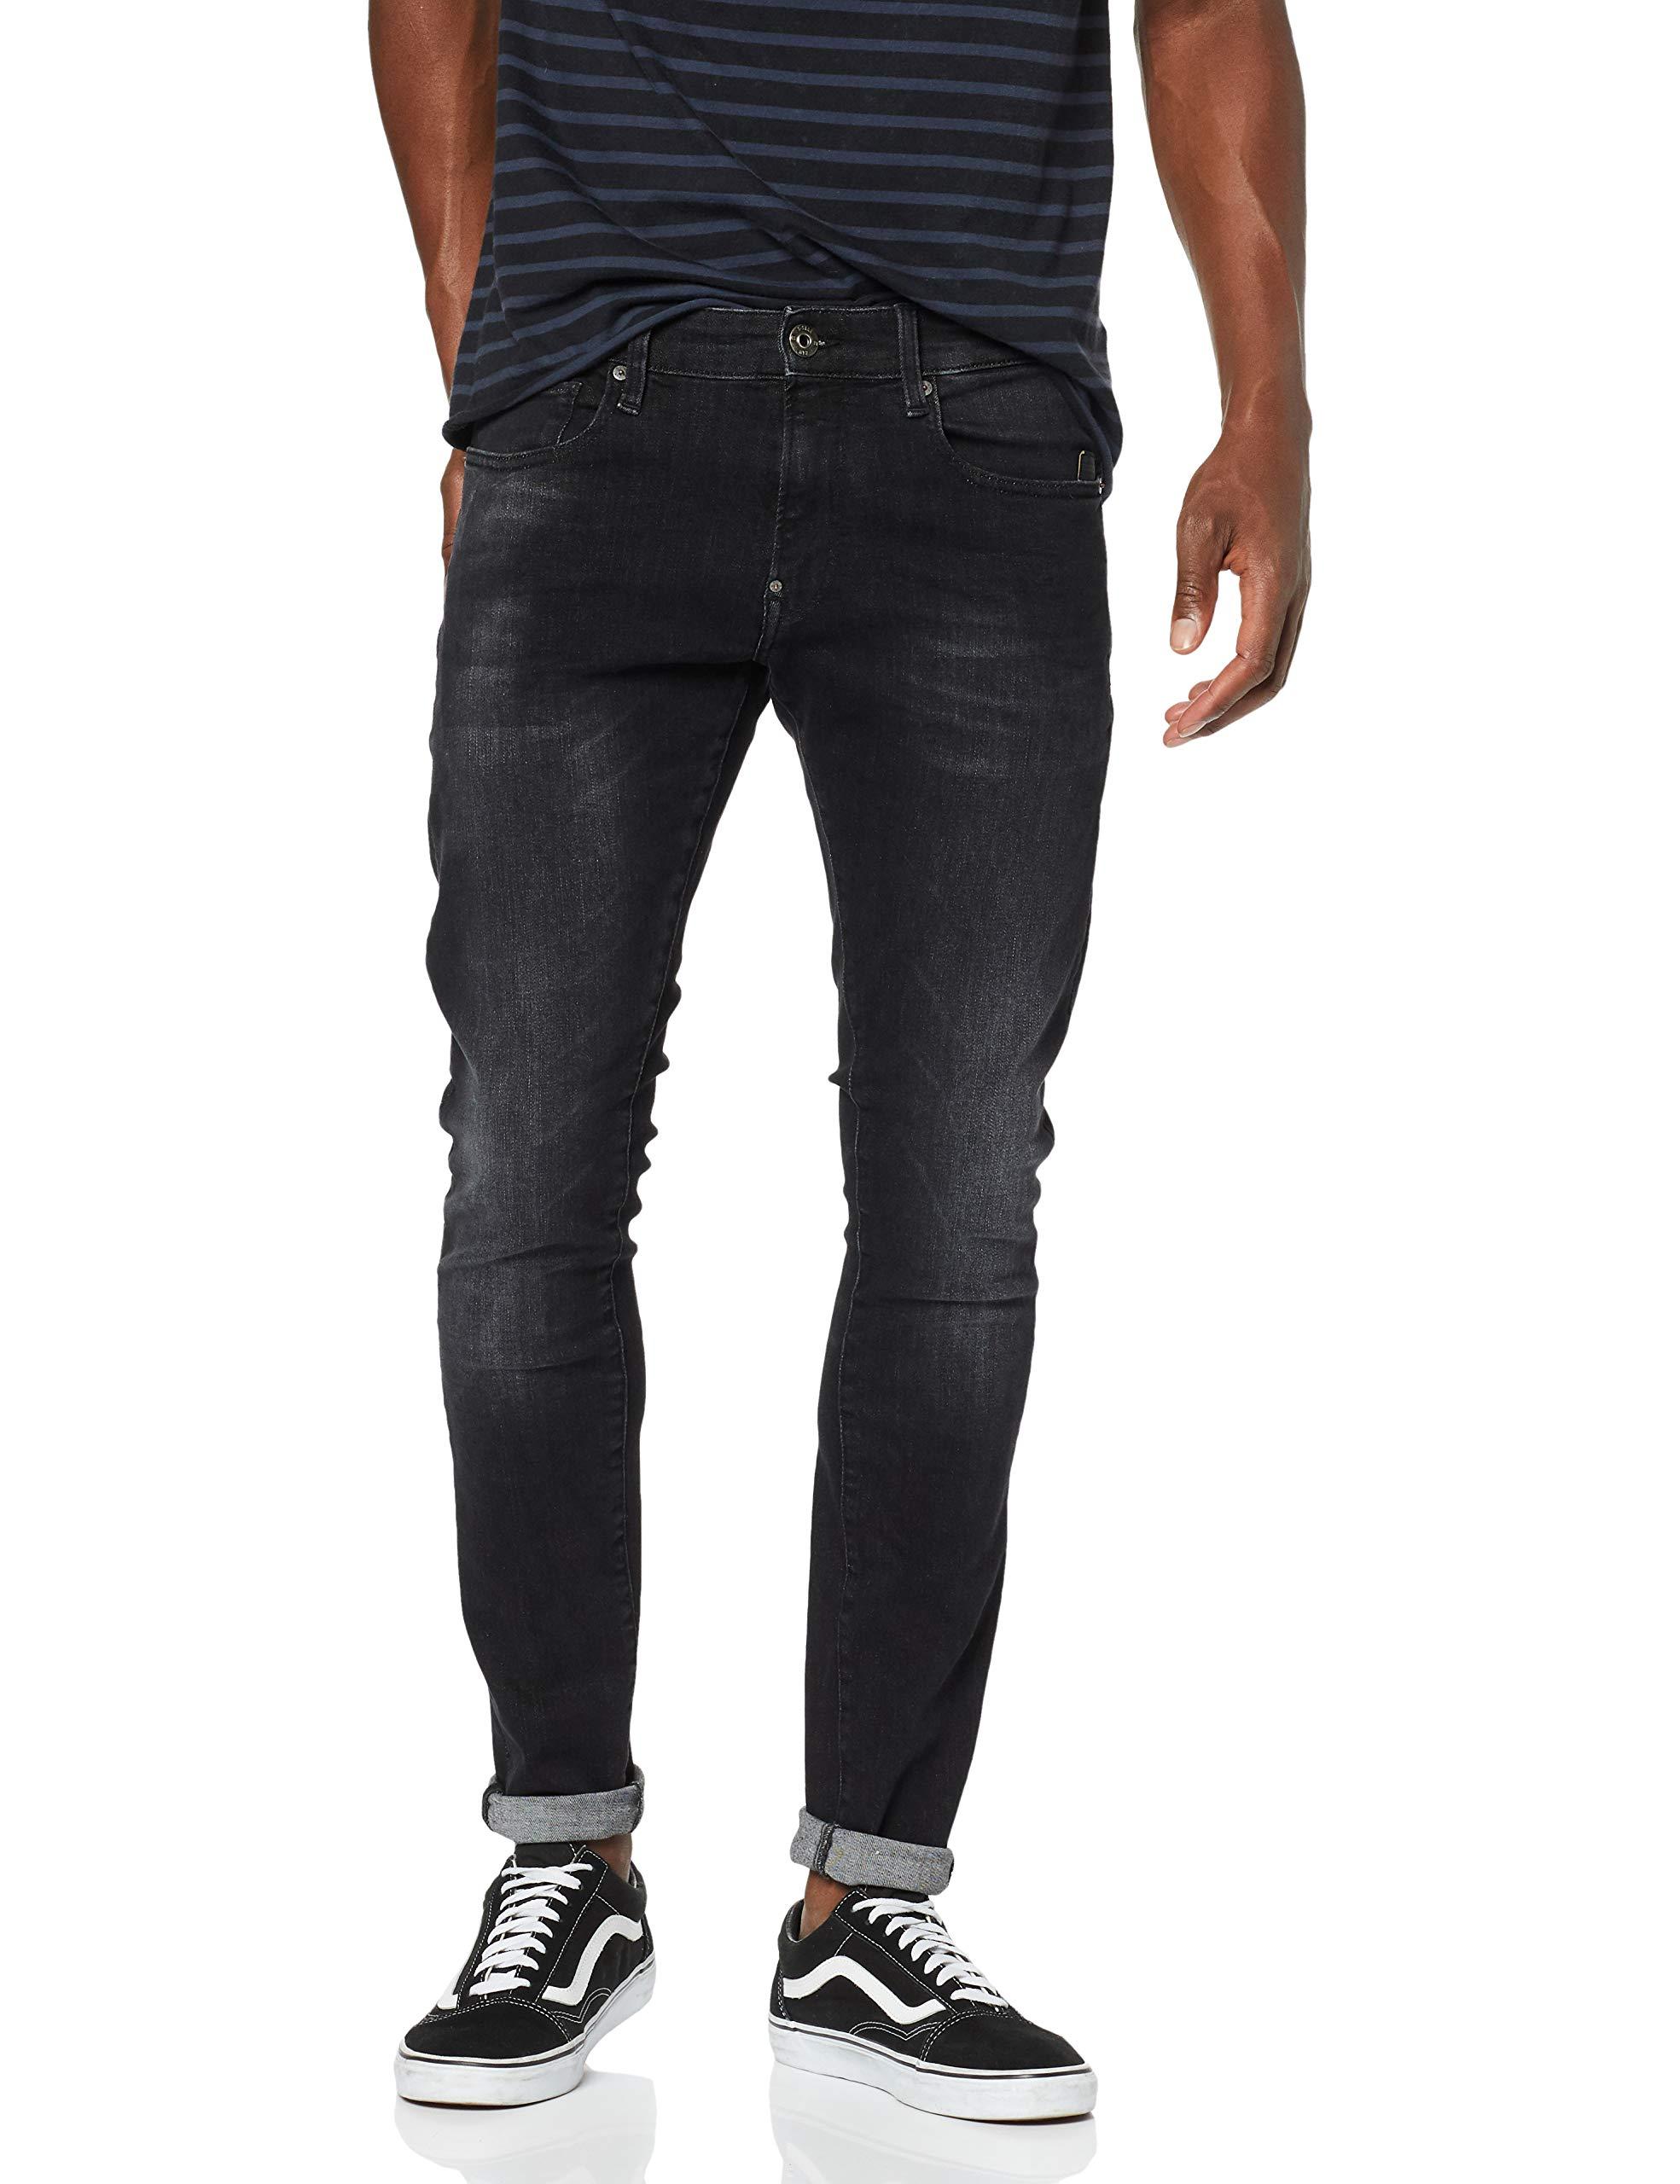 G l34taille Fabricant29wL34 a592W29 Revend star Faded Raw Super SlimJeans A634 Aged HommeNoirmedium zpUVSMq